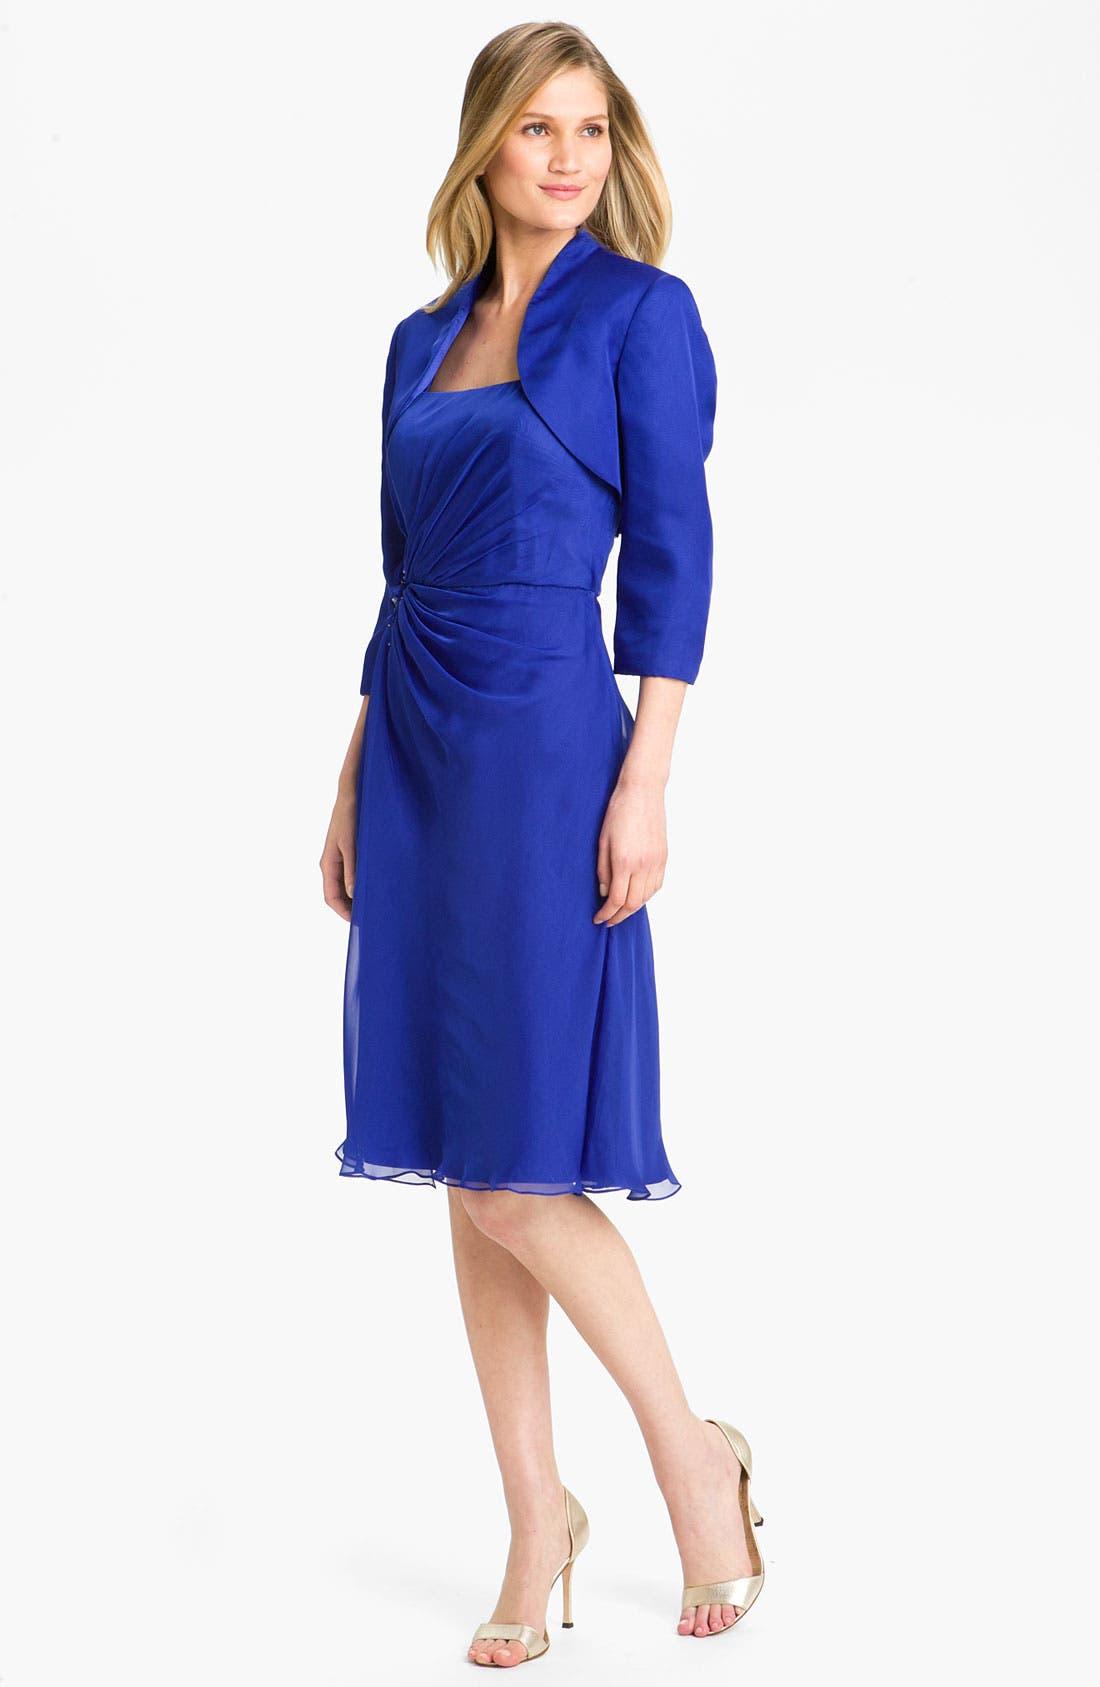 Alternate Image 1 Selected - Veni Infantino Ruched Chiffon Dress & Bolero